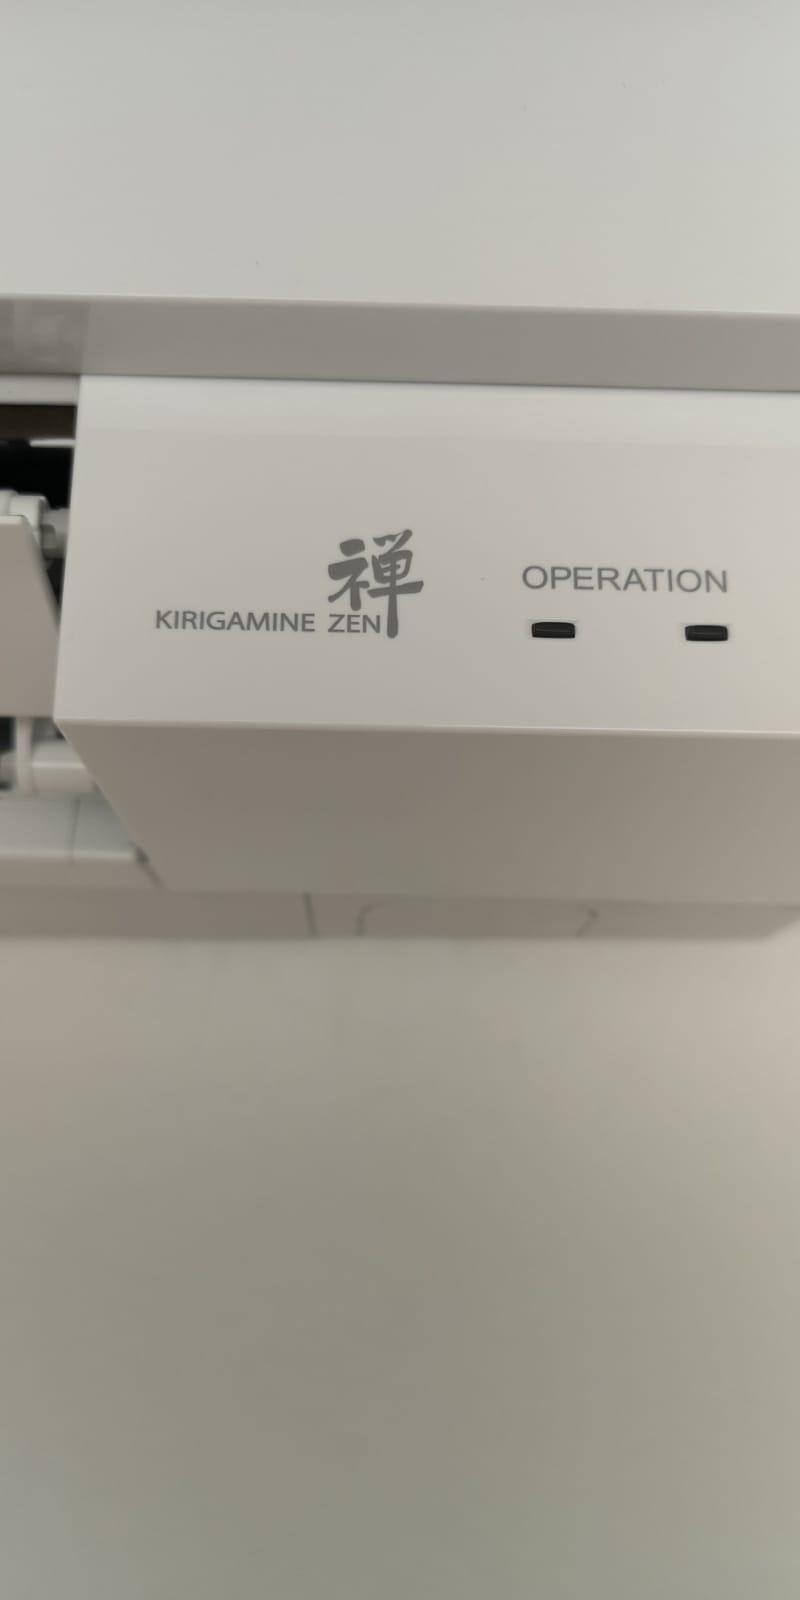 Serie MSZ-EF Kirigamine Zen